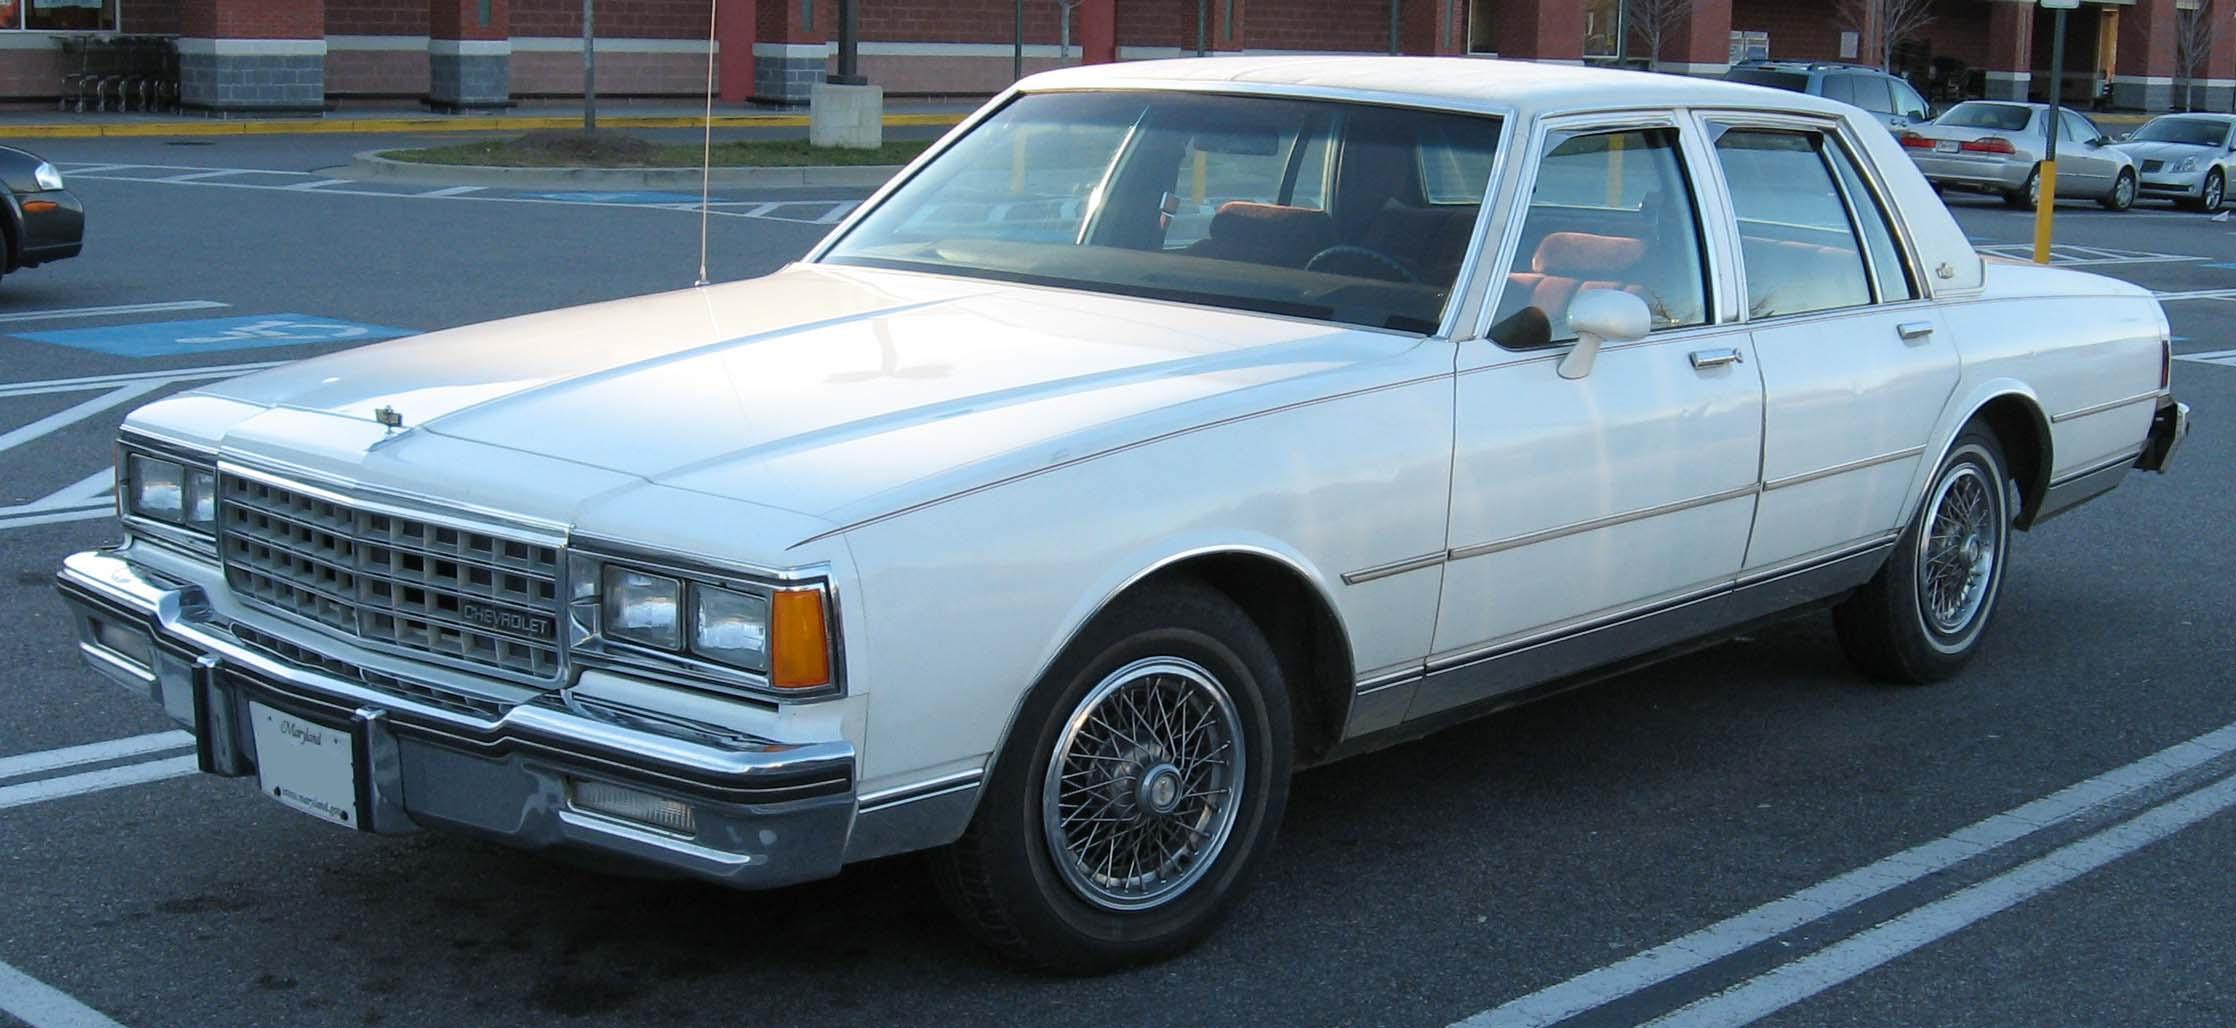 ClassicCaprice 1990 Chevrolet Caprice Specs, Photos, Modification ...